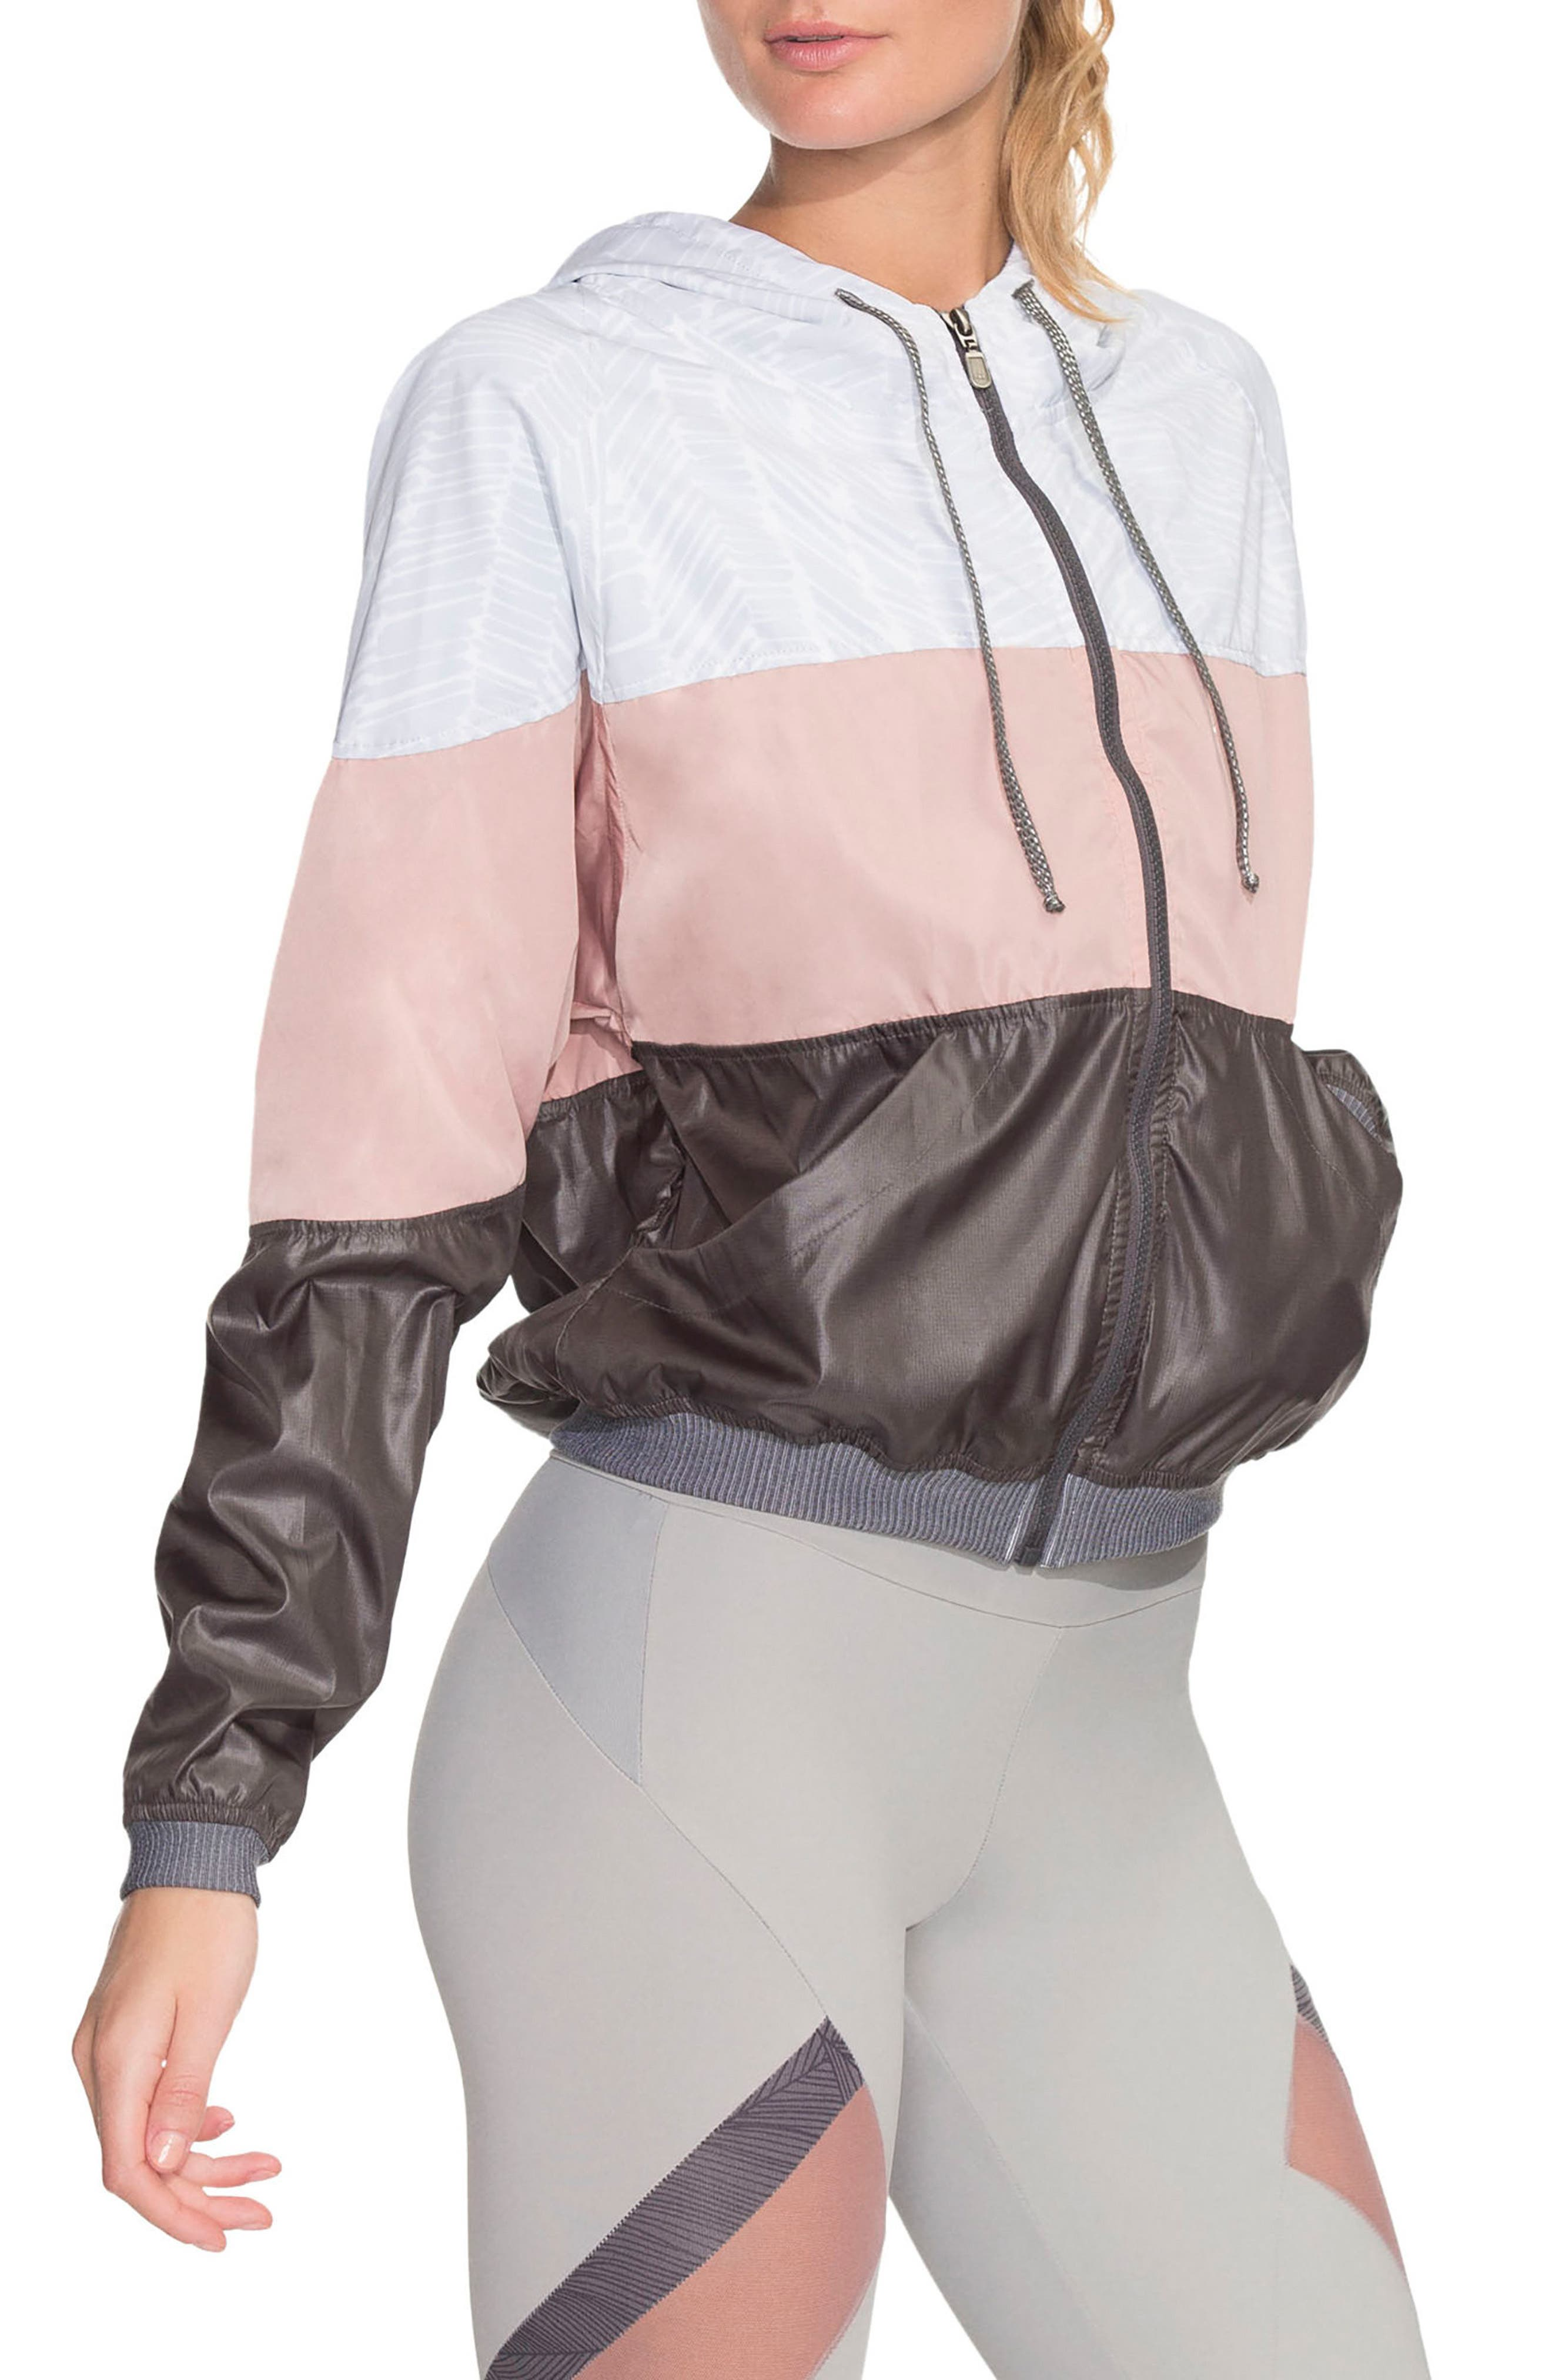 Breakers Leaf Jacket,                         Main,                         color, 104